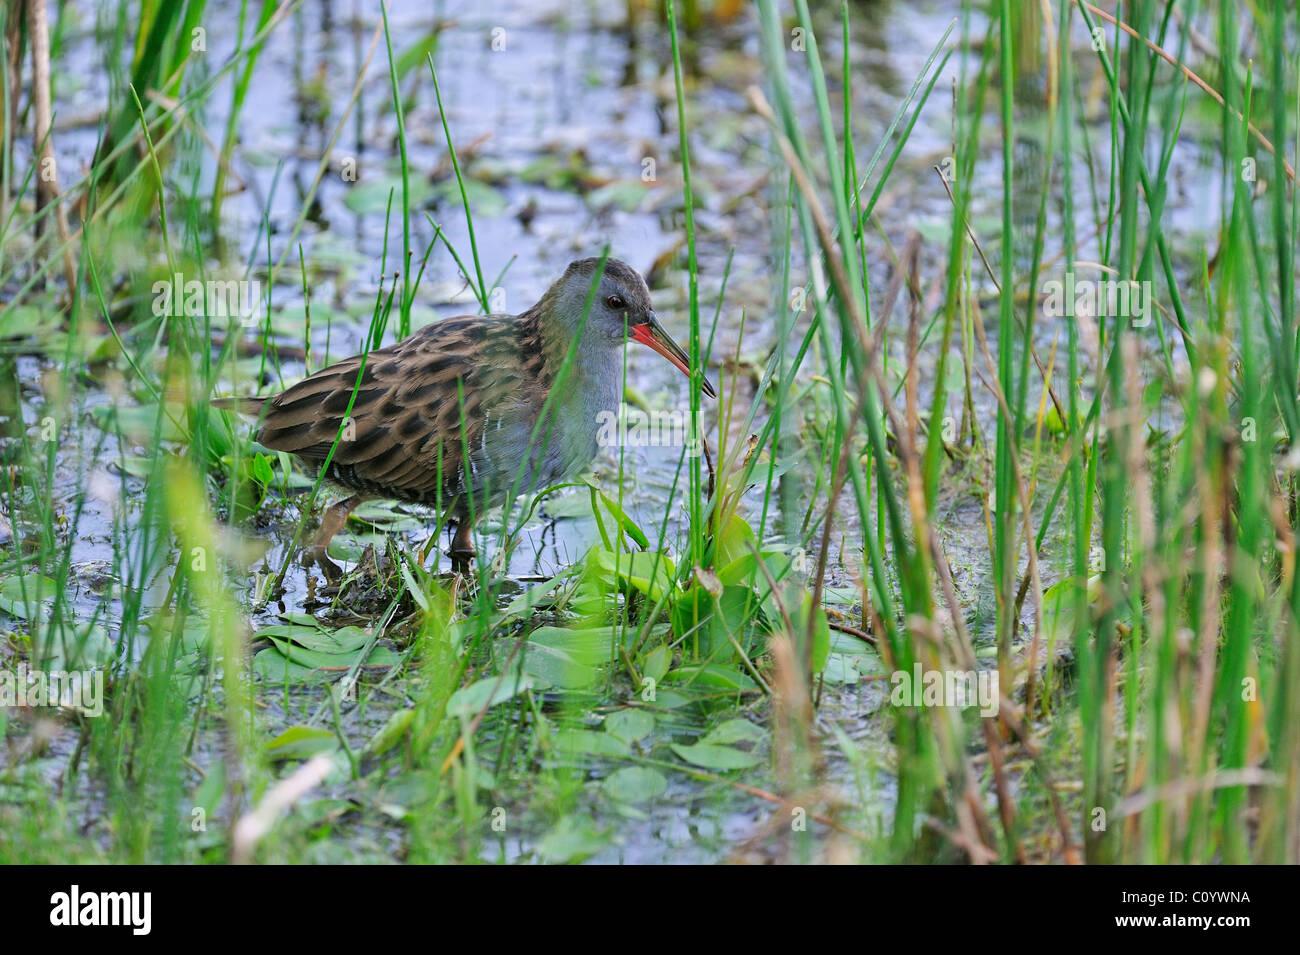 Water Rail (Rallus aquaticus) walking through water vegetation in lake - Stock Image